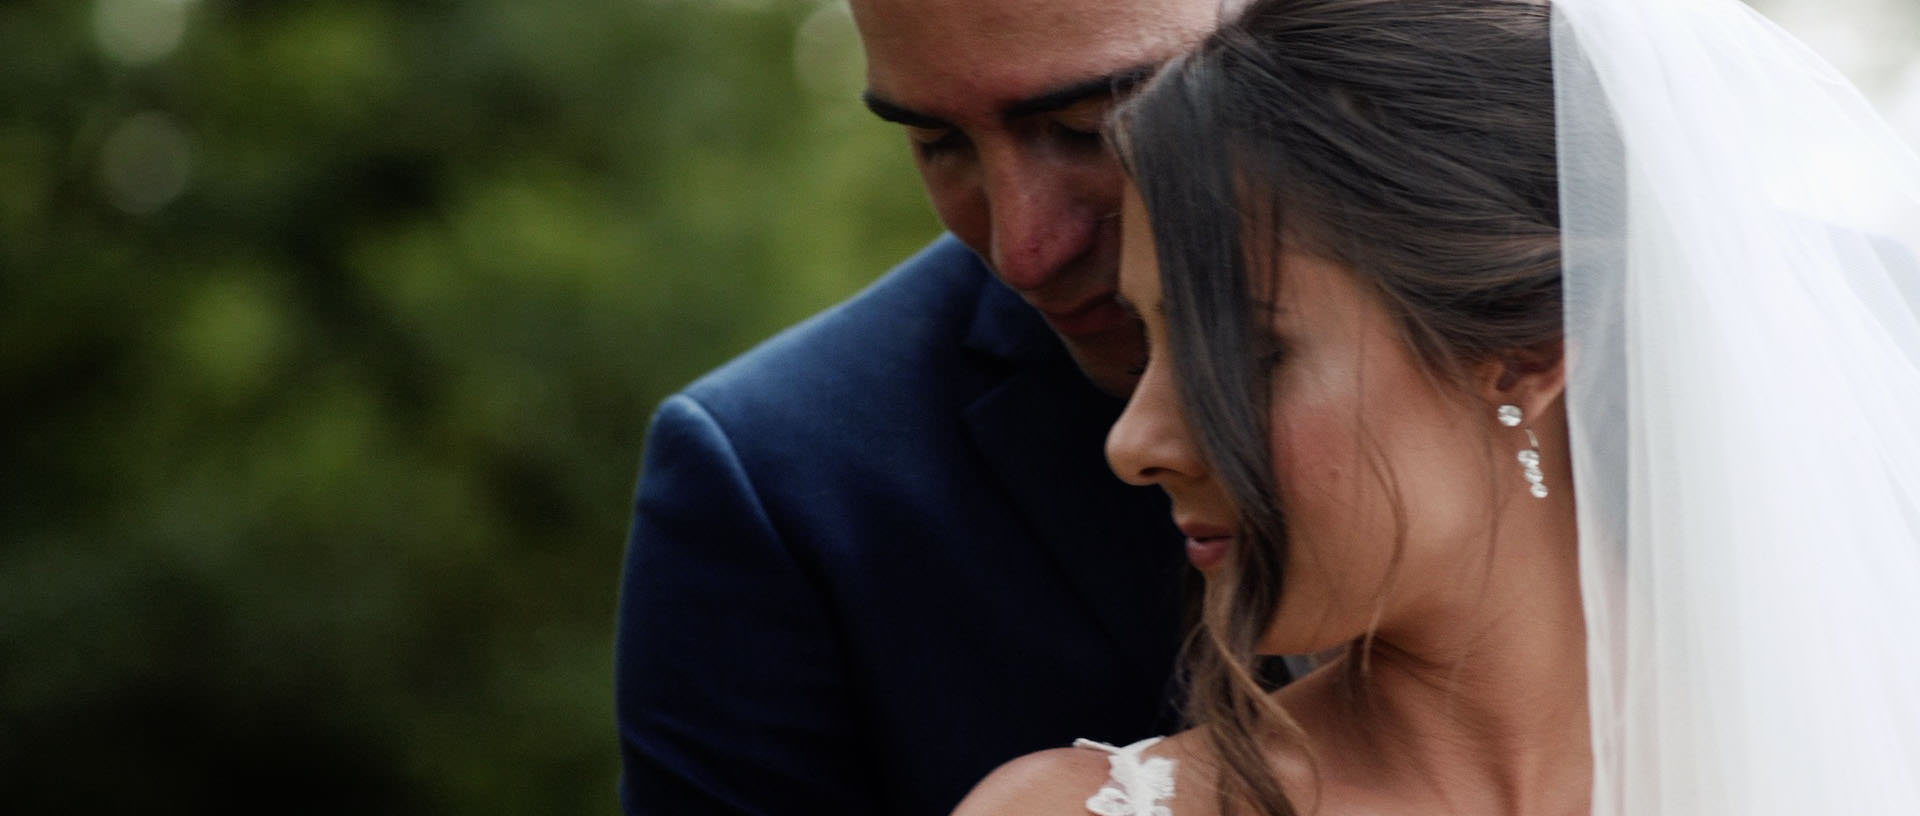 Hyde Barn Colswolds Wedding Verity-Jade & Kai 28 Cropped.jpg